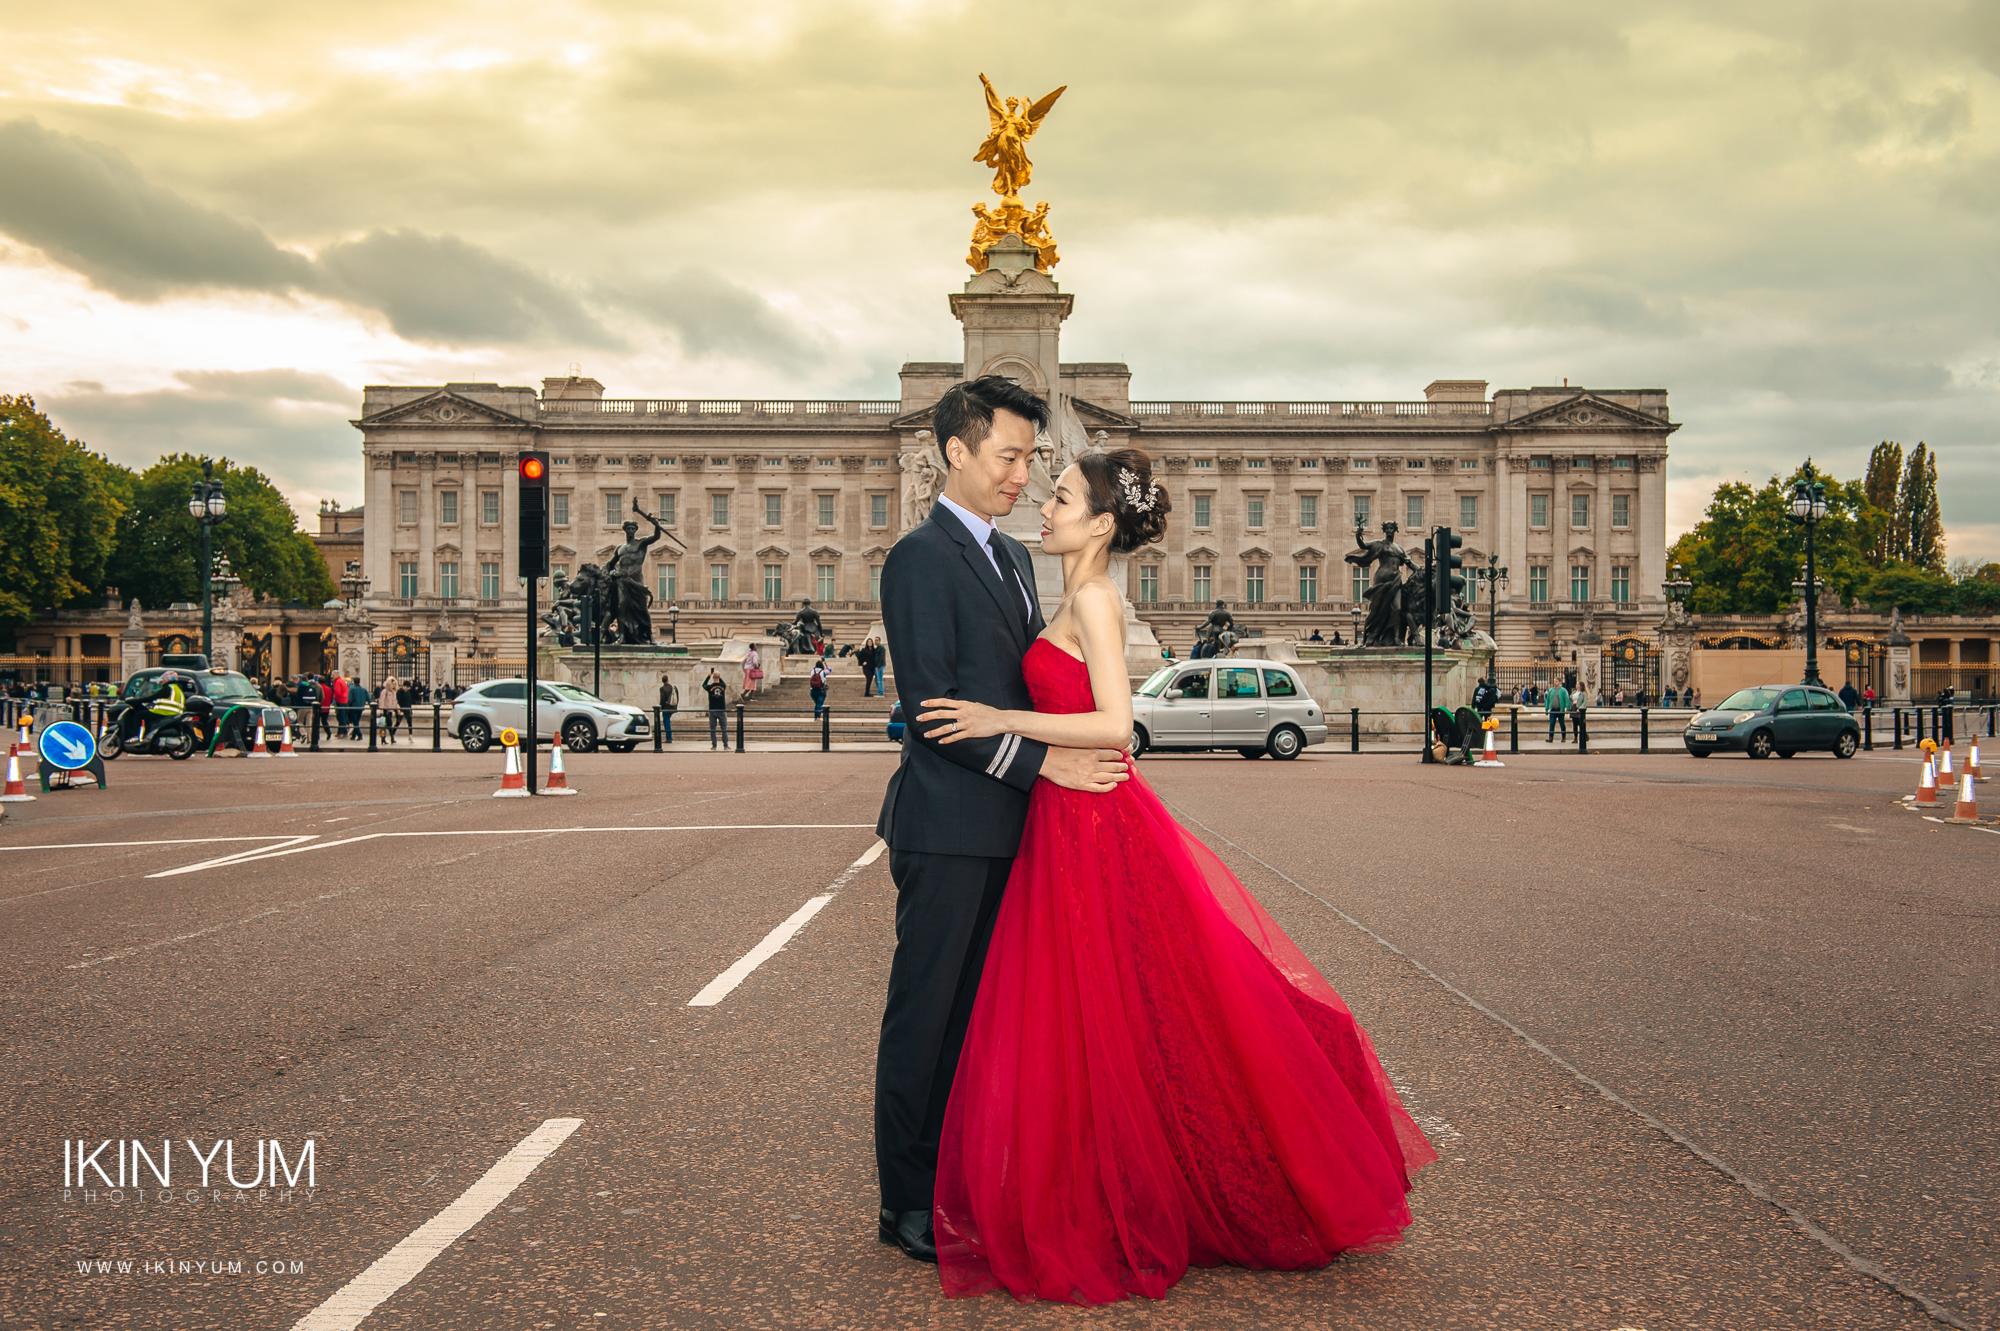 Yannis & Kenny Pre-Wedding Shoot - Ikin Yum Photography-0132.jpg